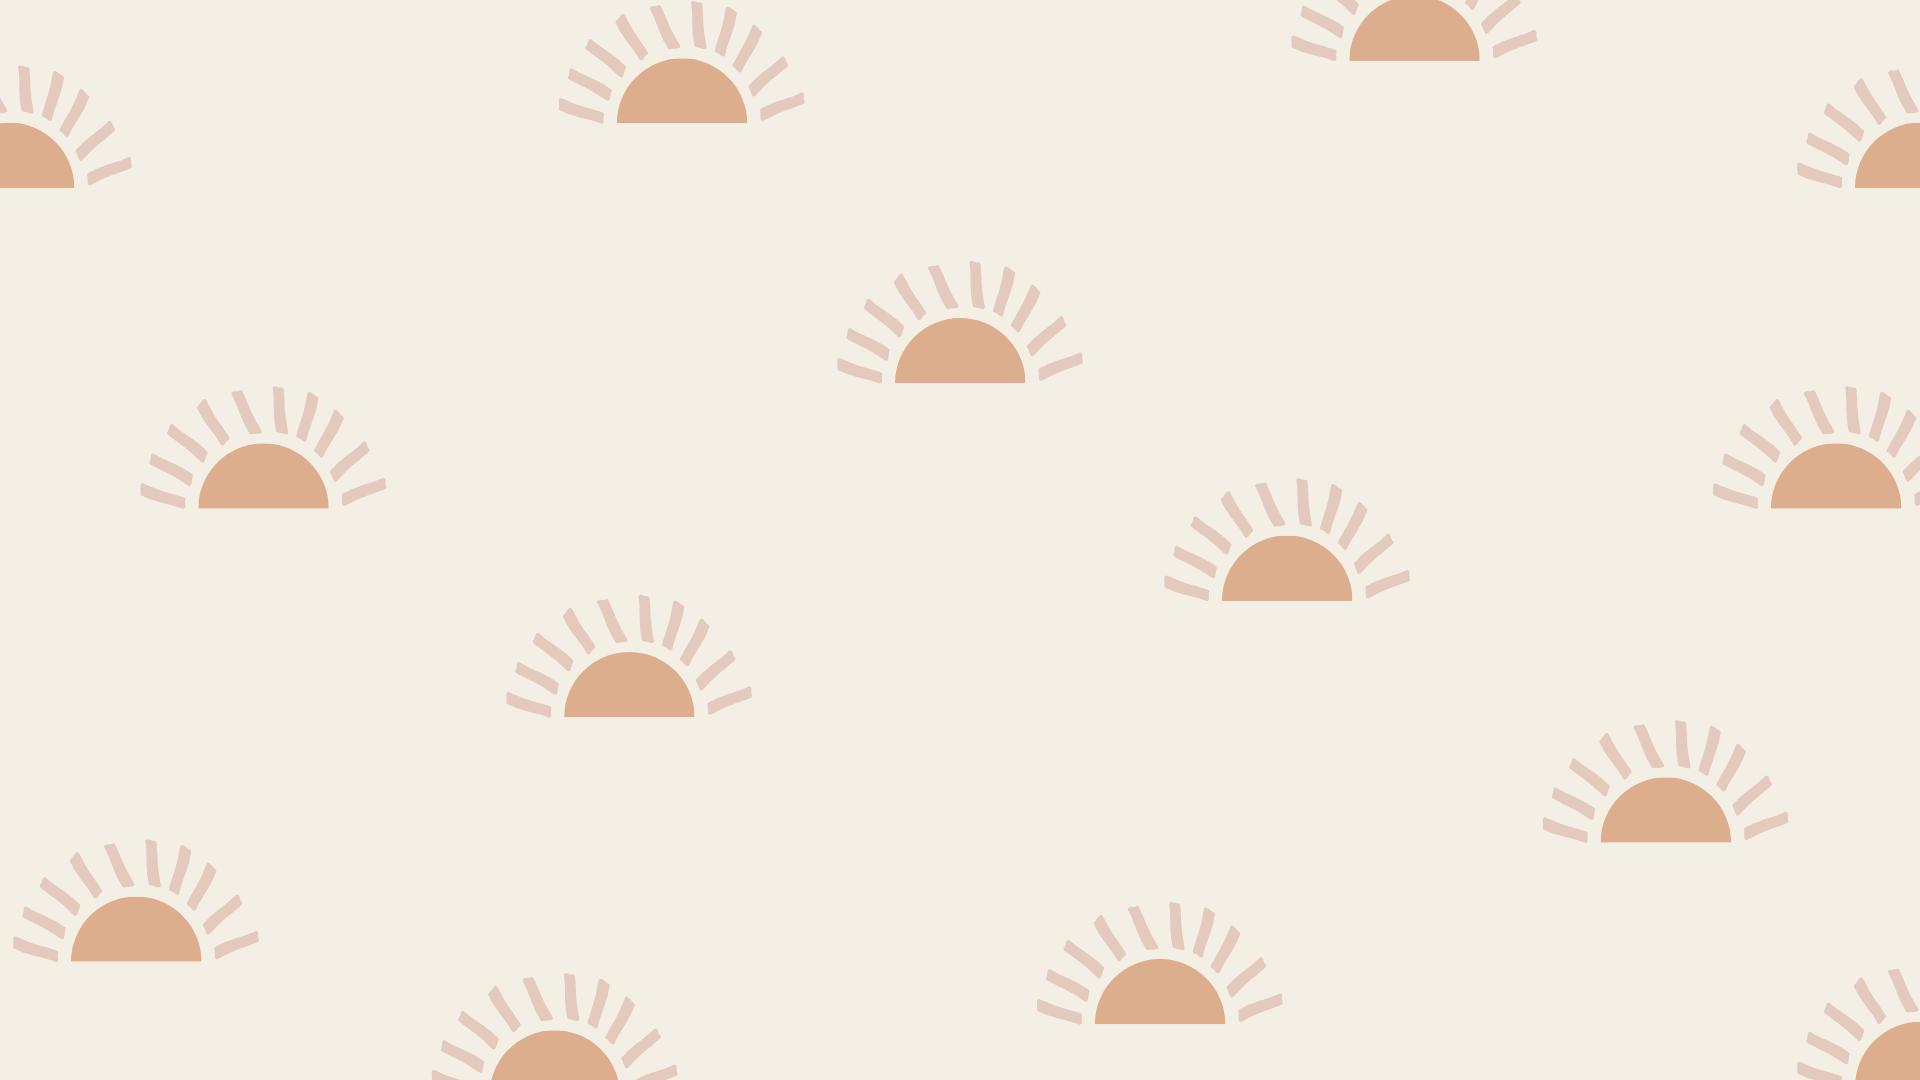 20 Boho Desktop Wallpapers Pink Digital Wallpapers Digital 1920x1080